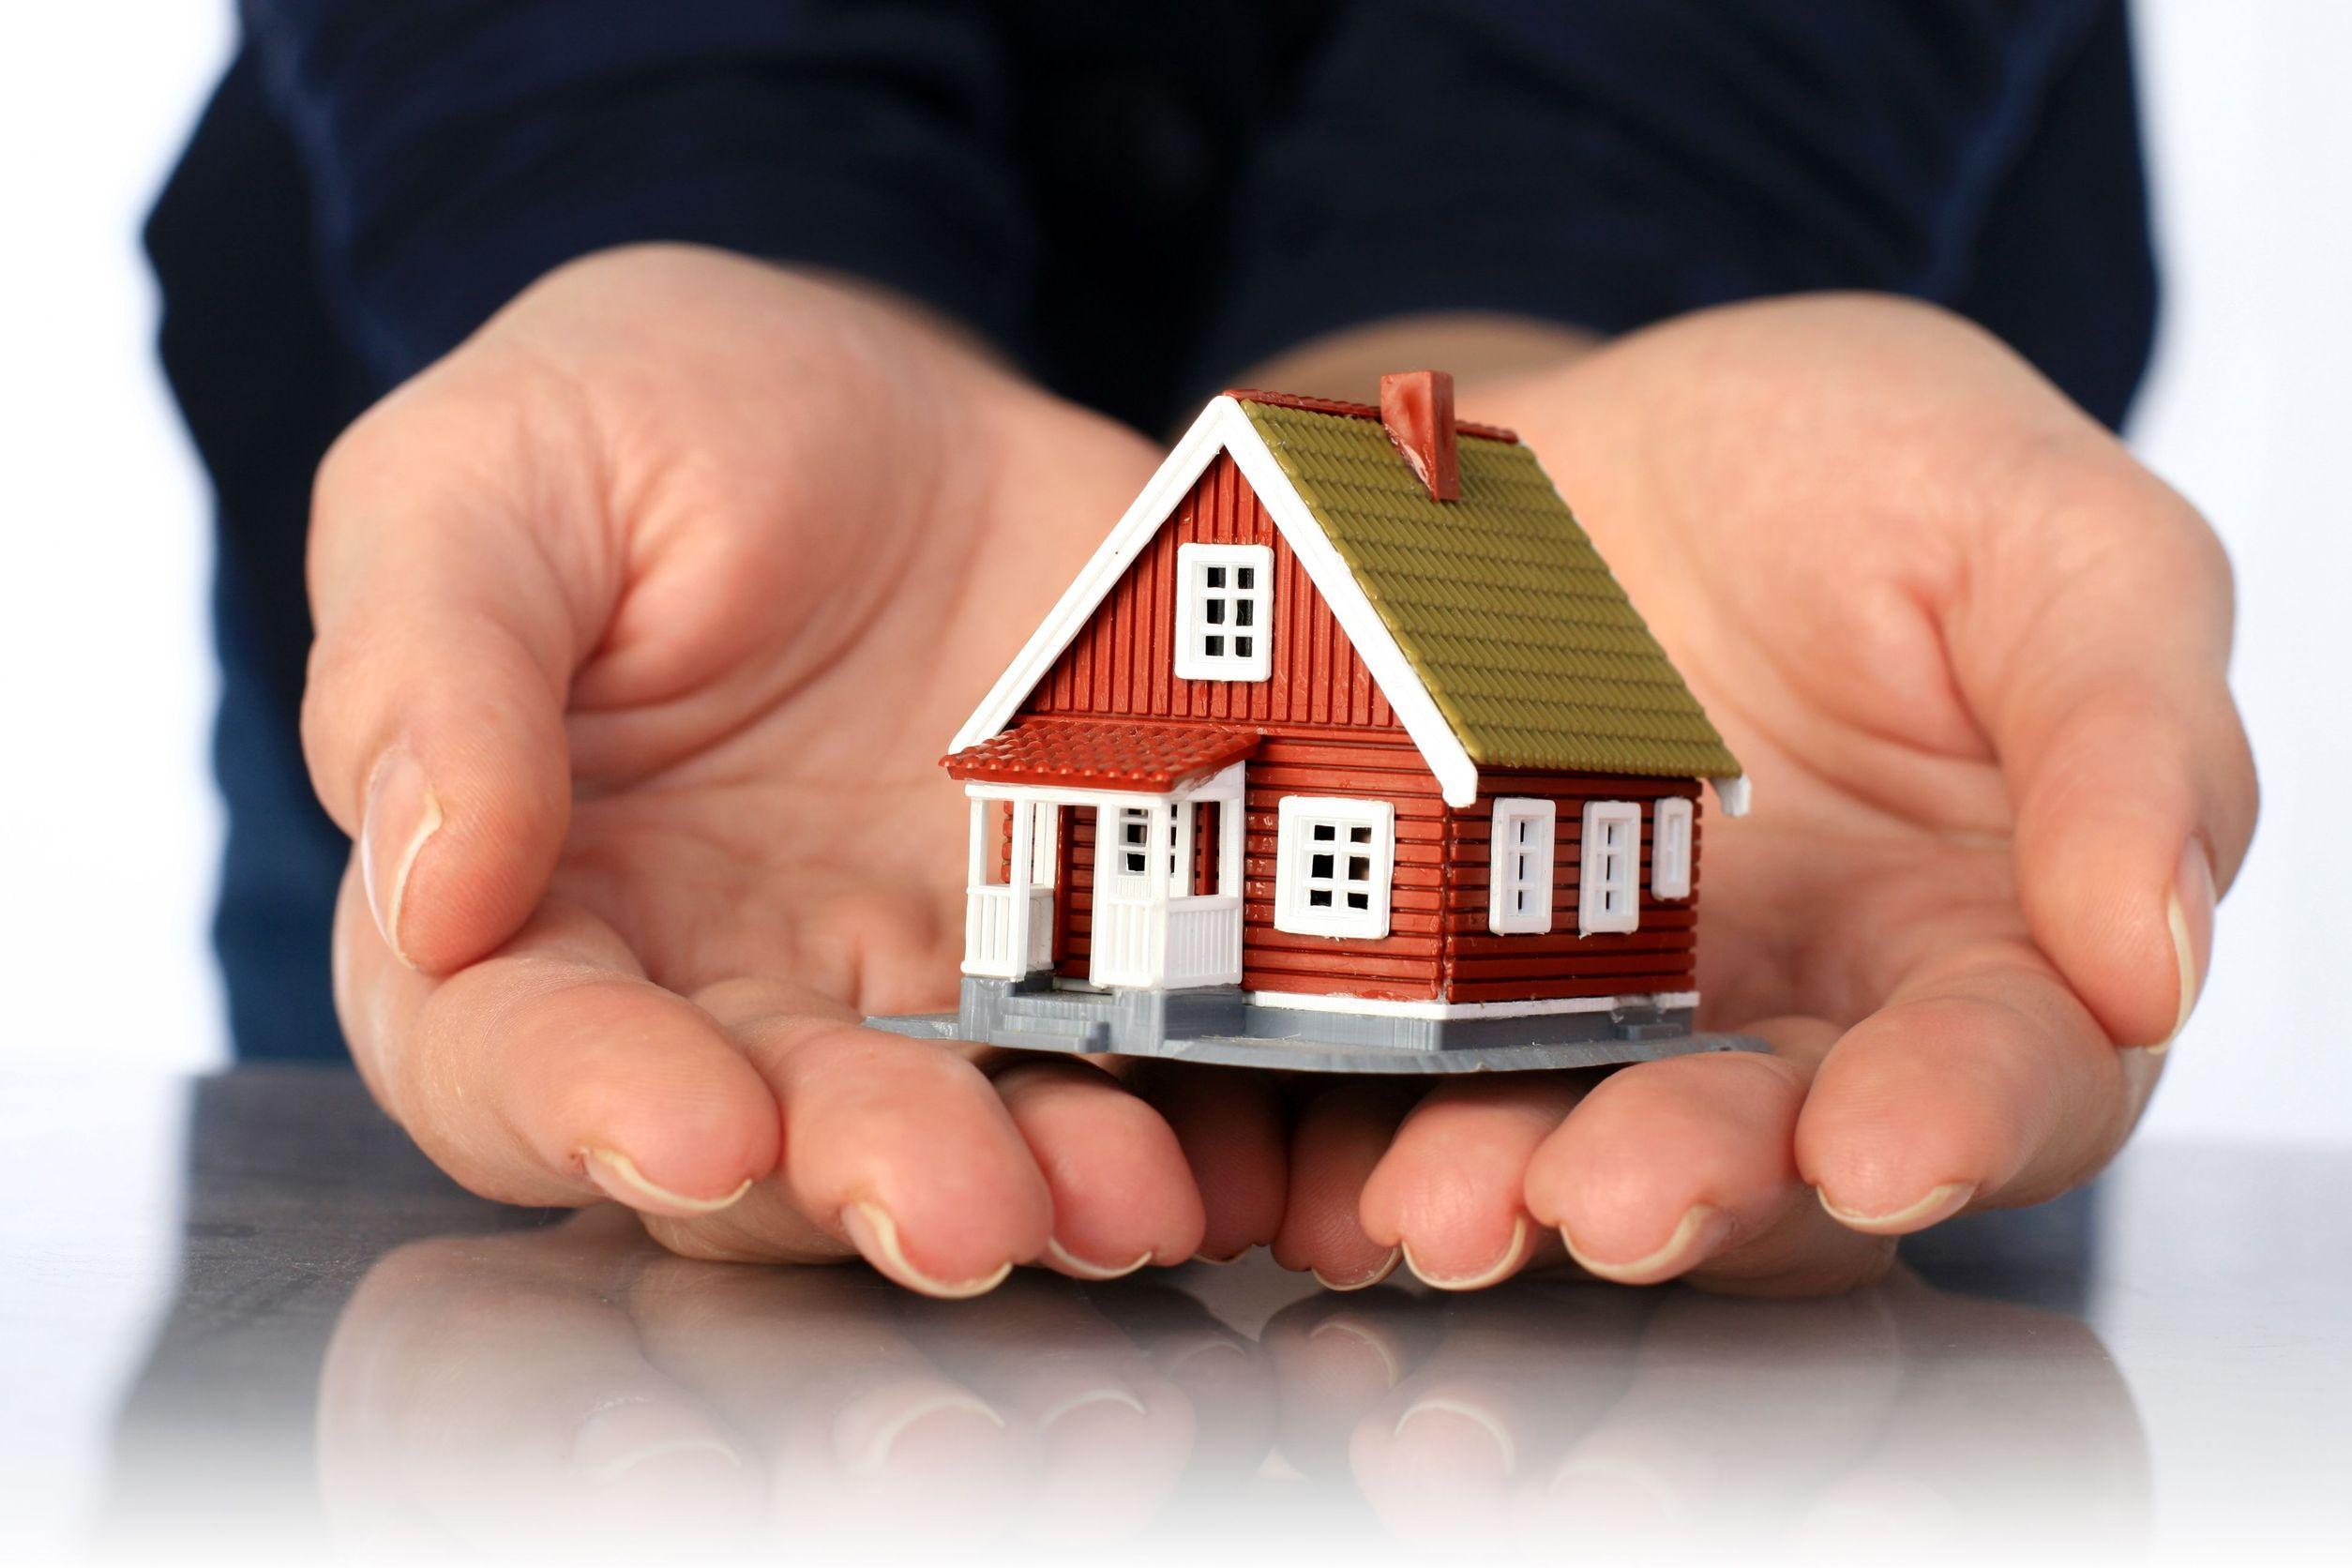 Epingle Sur Property Dealer In Raja Puri Raja Puri Property Dealer Real Estate In Raja Puri Real Estate